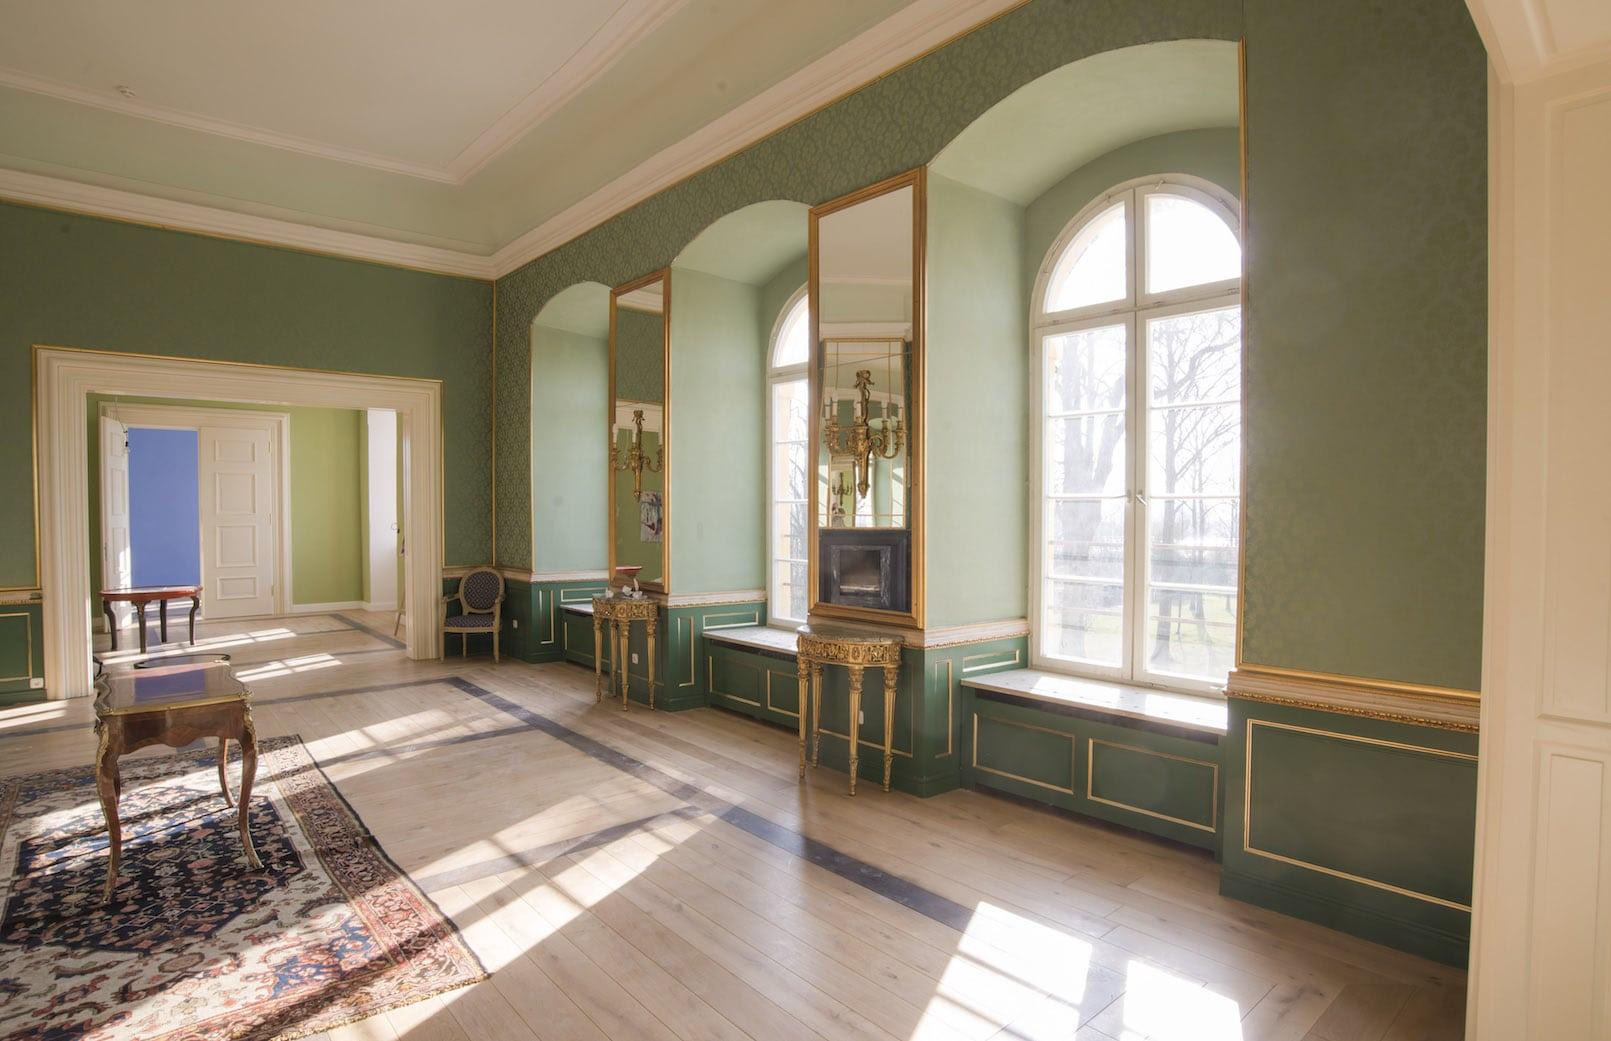 Schönborn Salon * Schloss Jägersburg